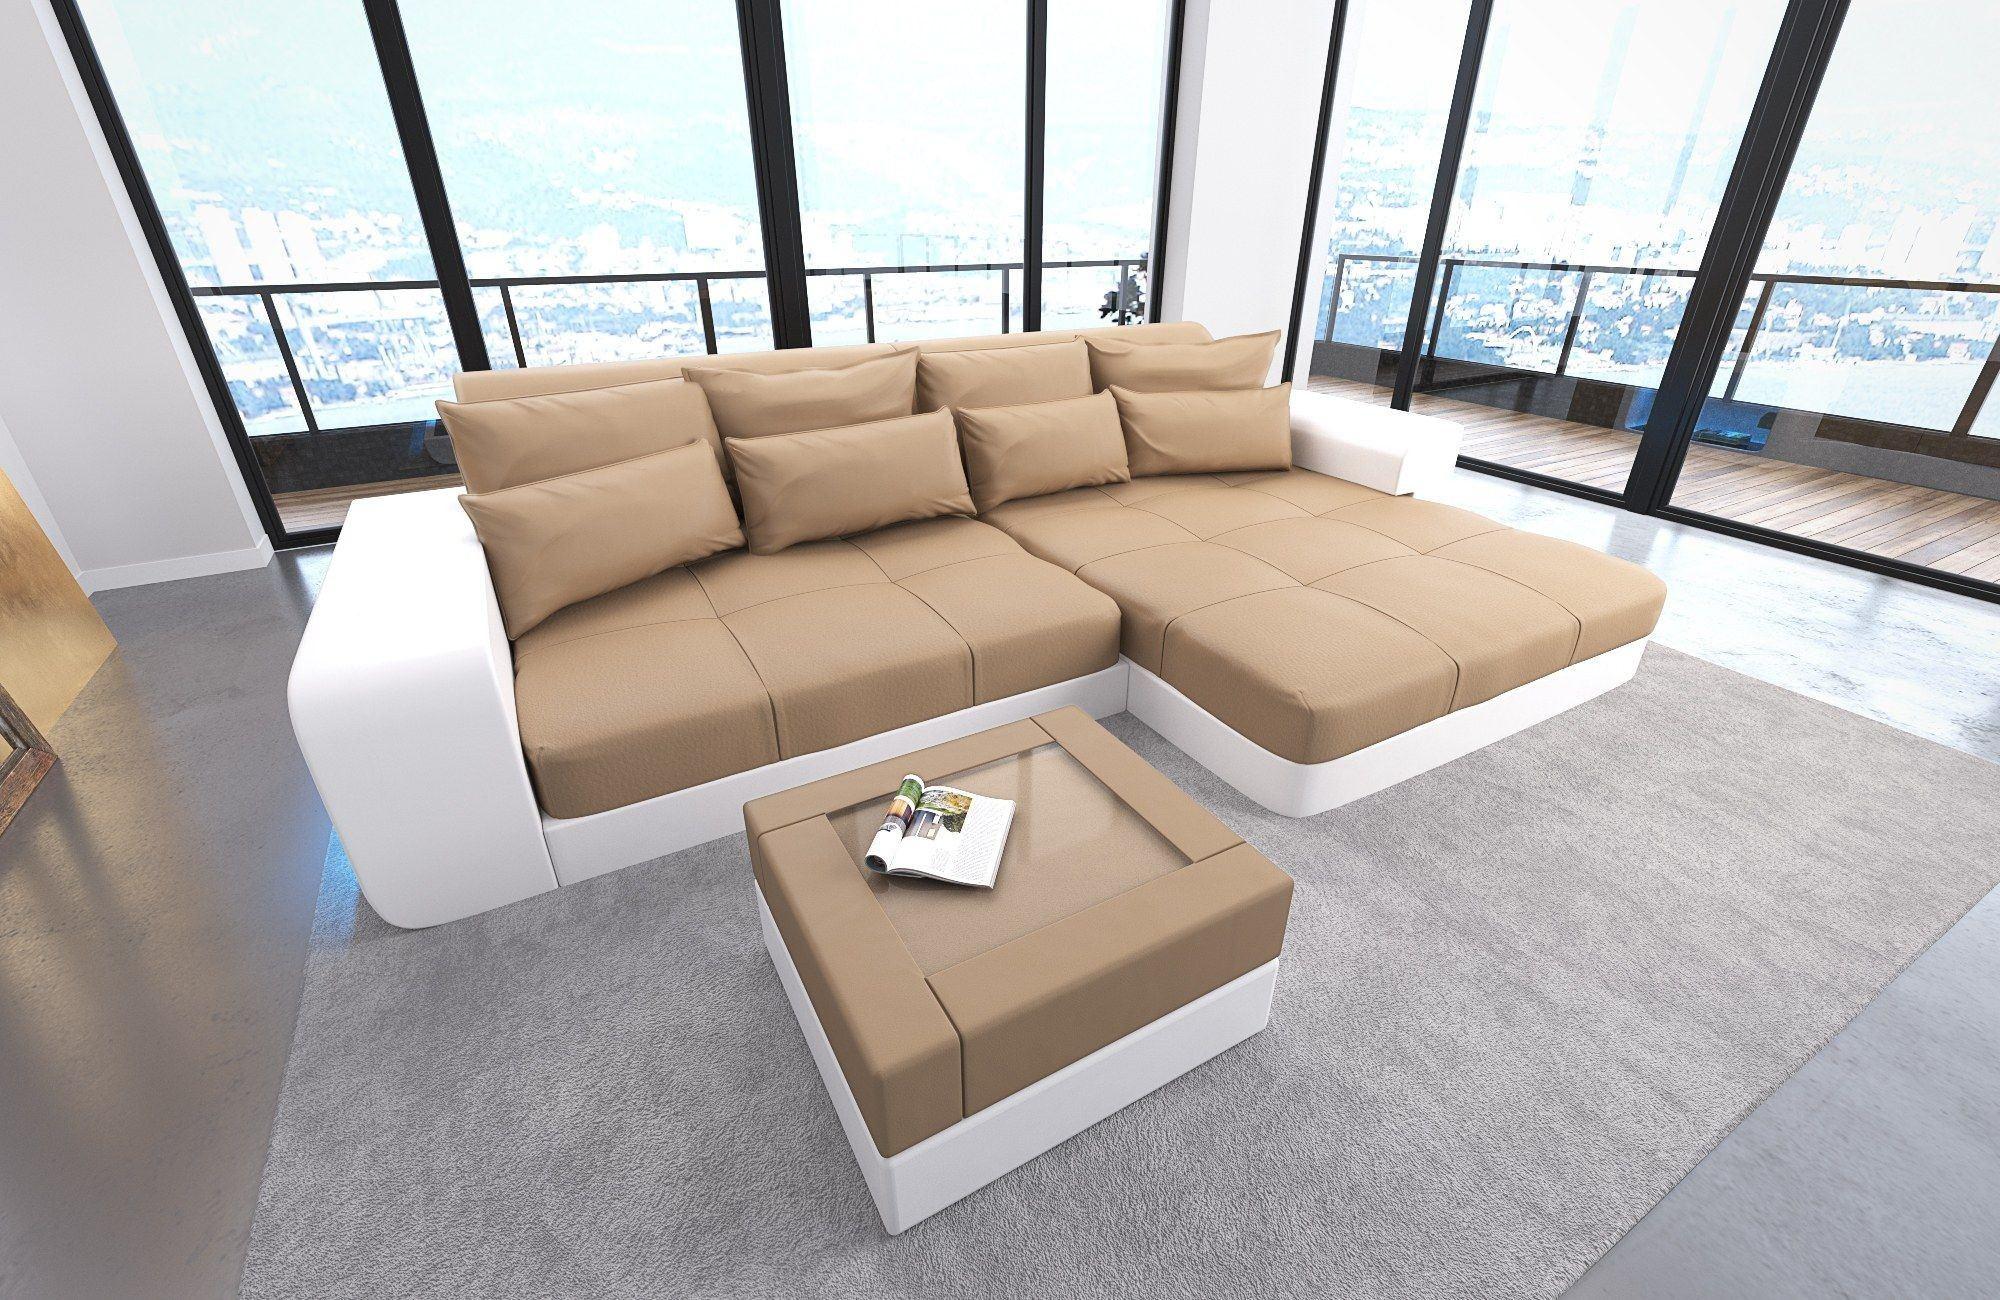 Full Size of Big Sofa Milano Als Ledersofa Zum Relaxen Lounge Mit Licht Hersteller Weißes Flexform Koinor Schlaf Canape Home Affaire Relaxfunktion Le Corbusier 3er Grau Sofa Big Sofa Leder